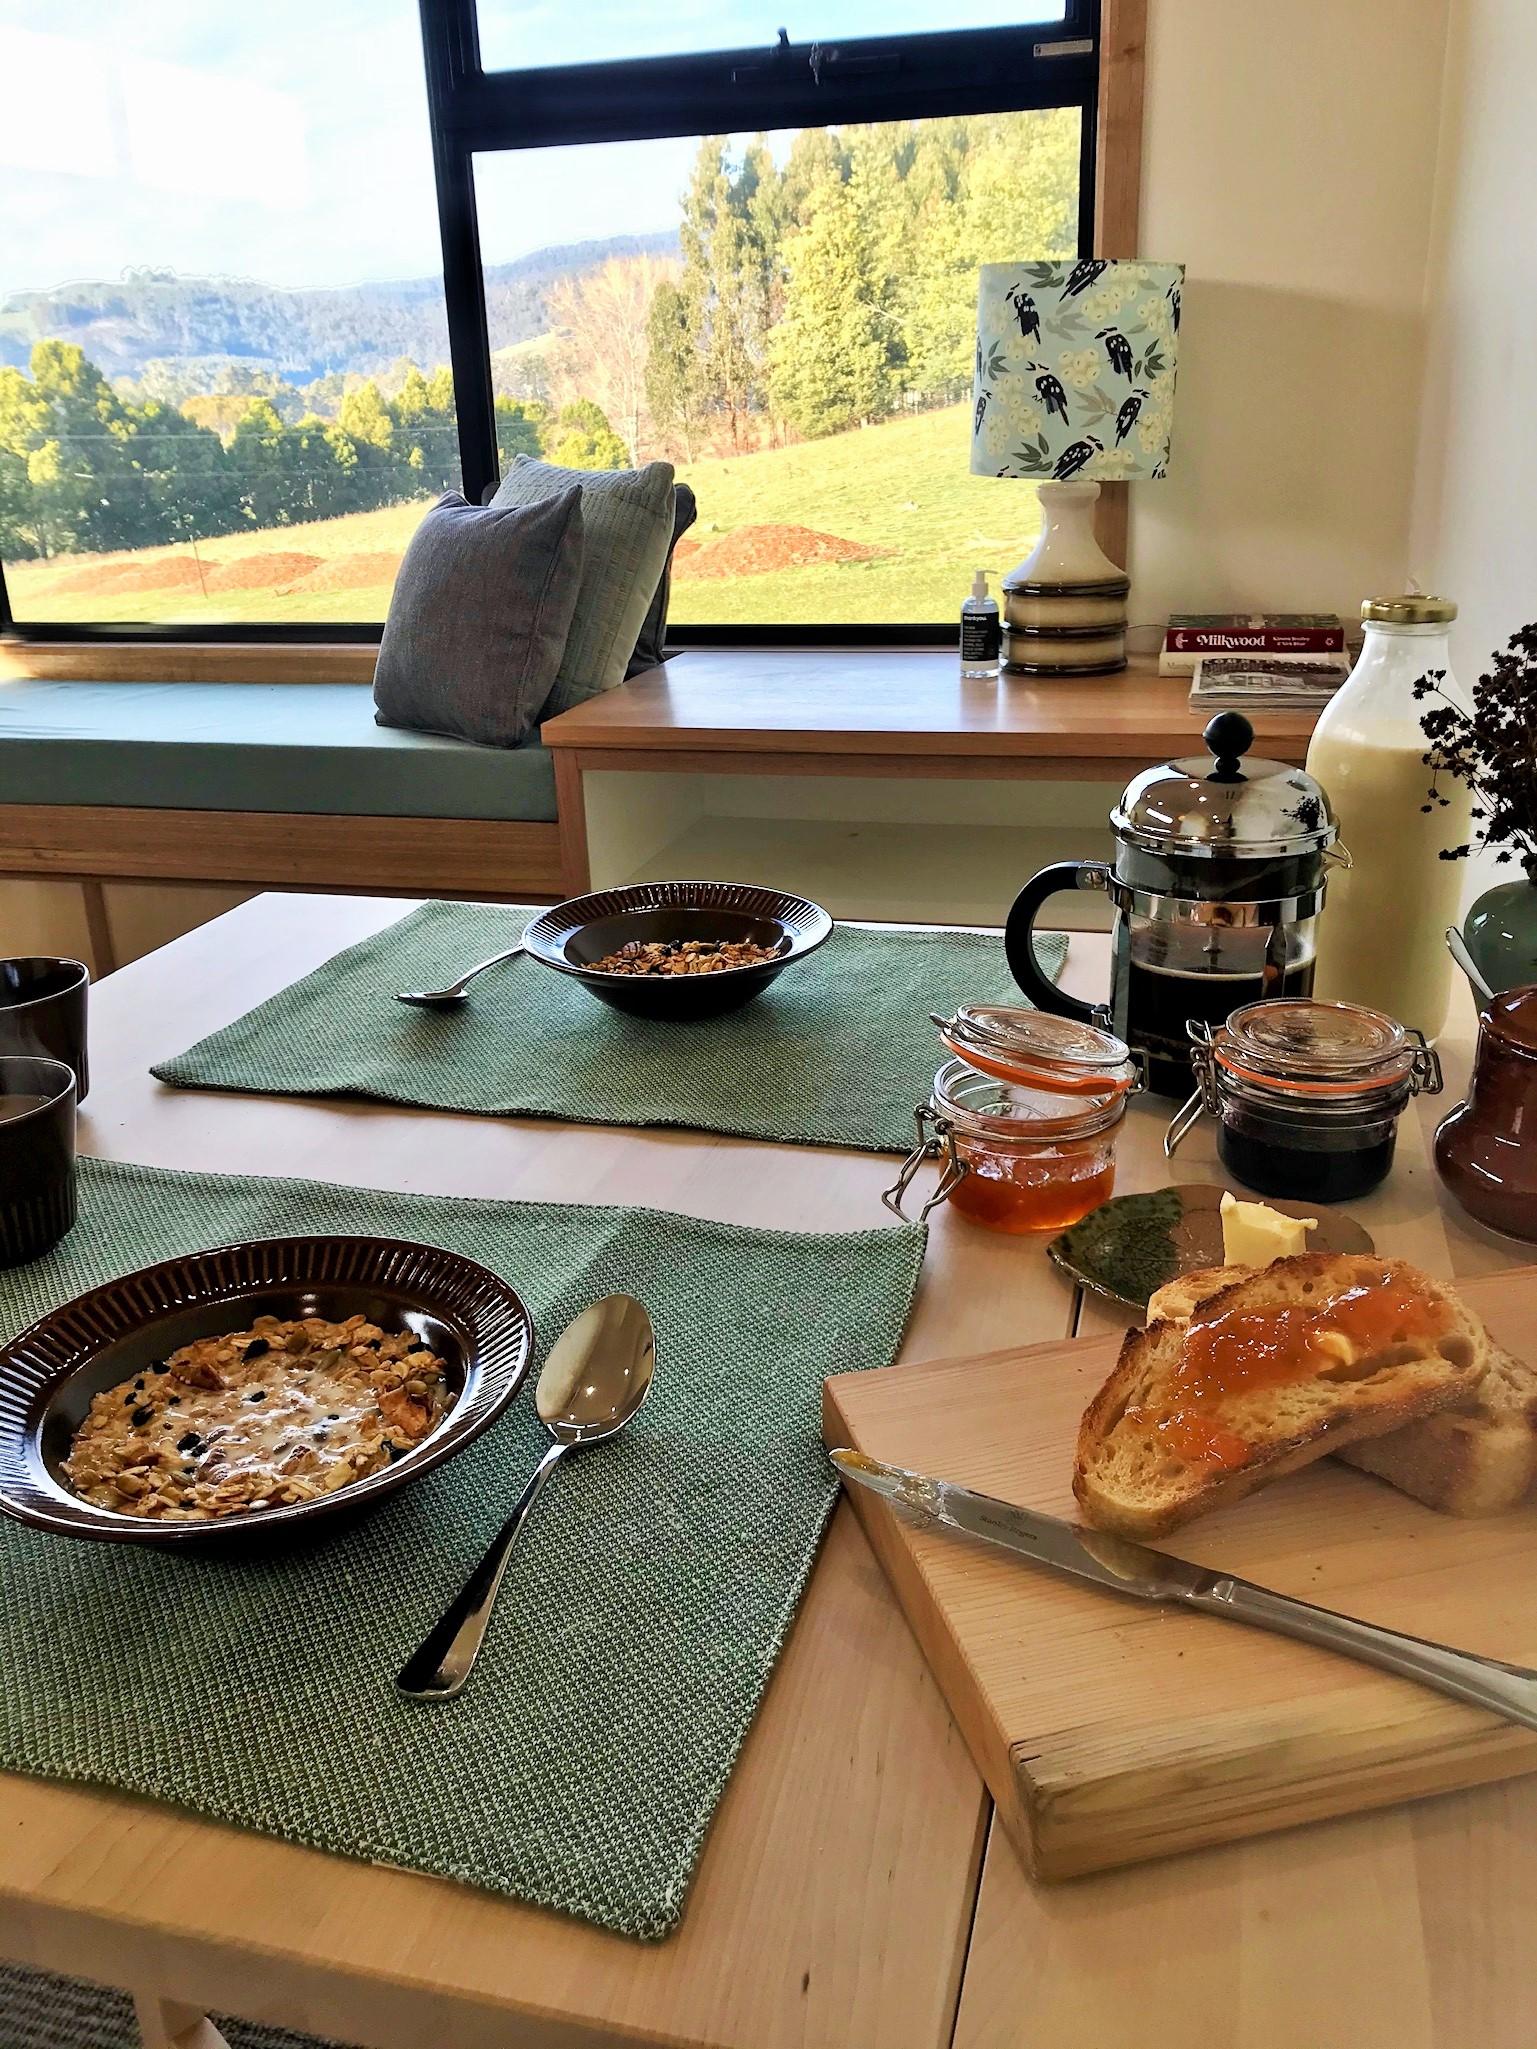 seasonal local breakfast for 2